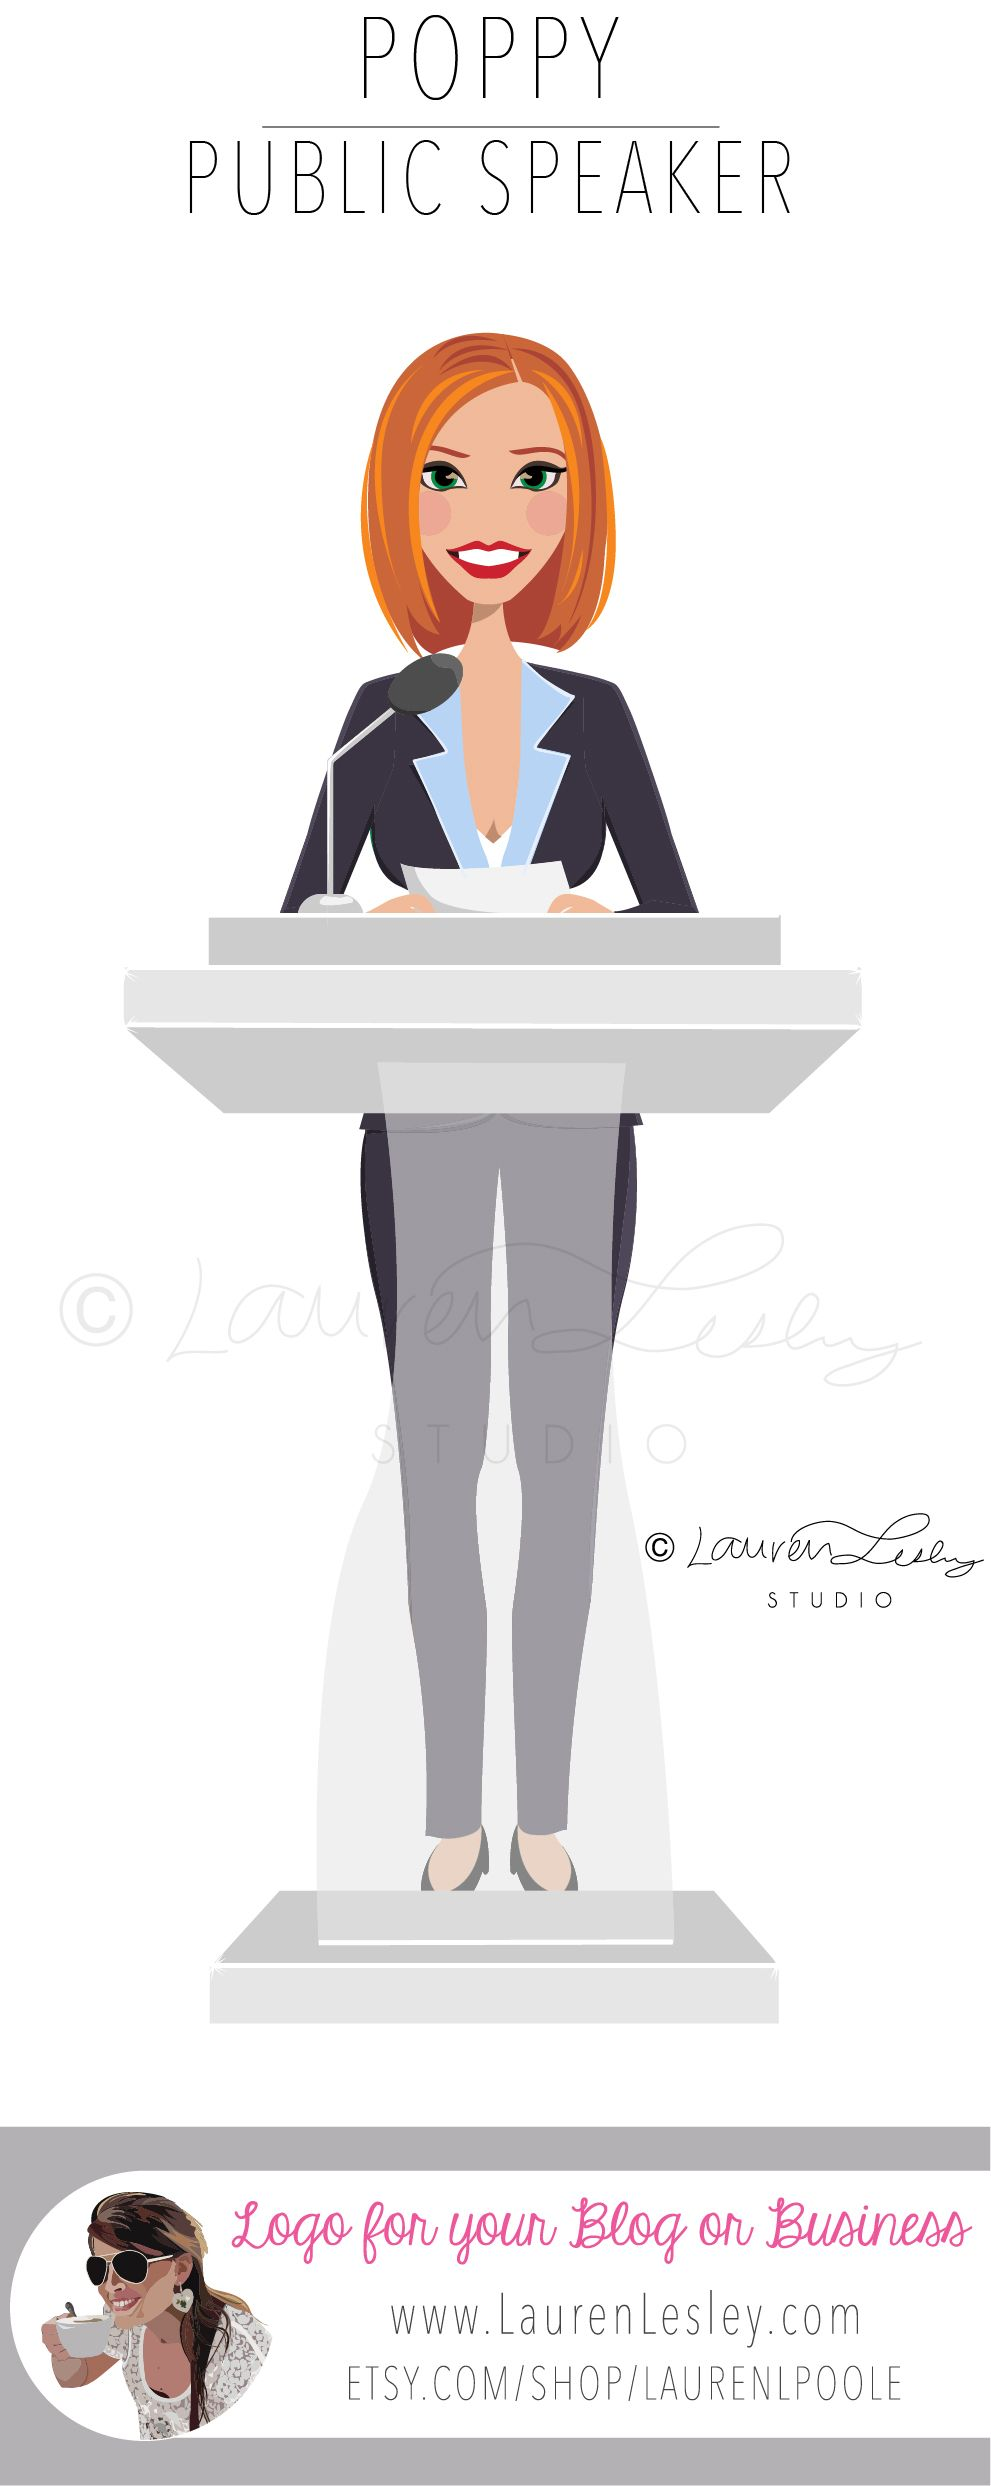 Public Speaker Politician Leader Life Coach